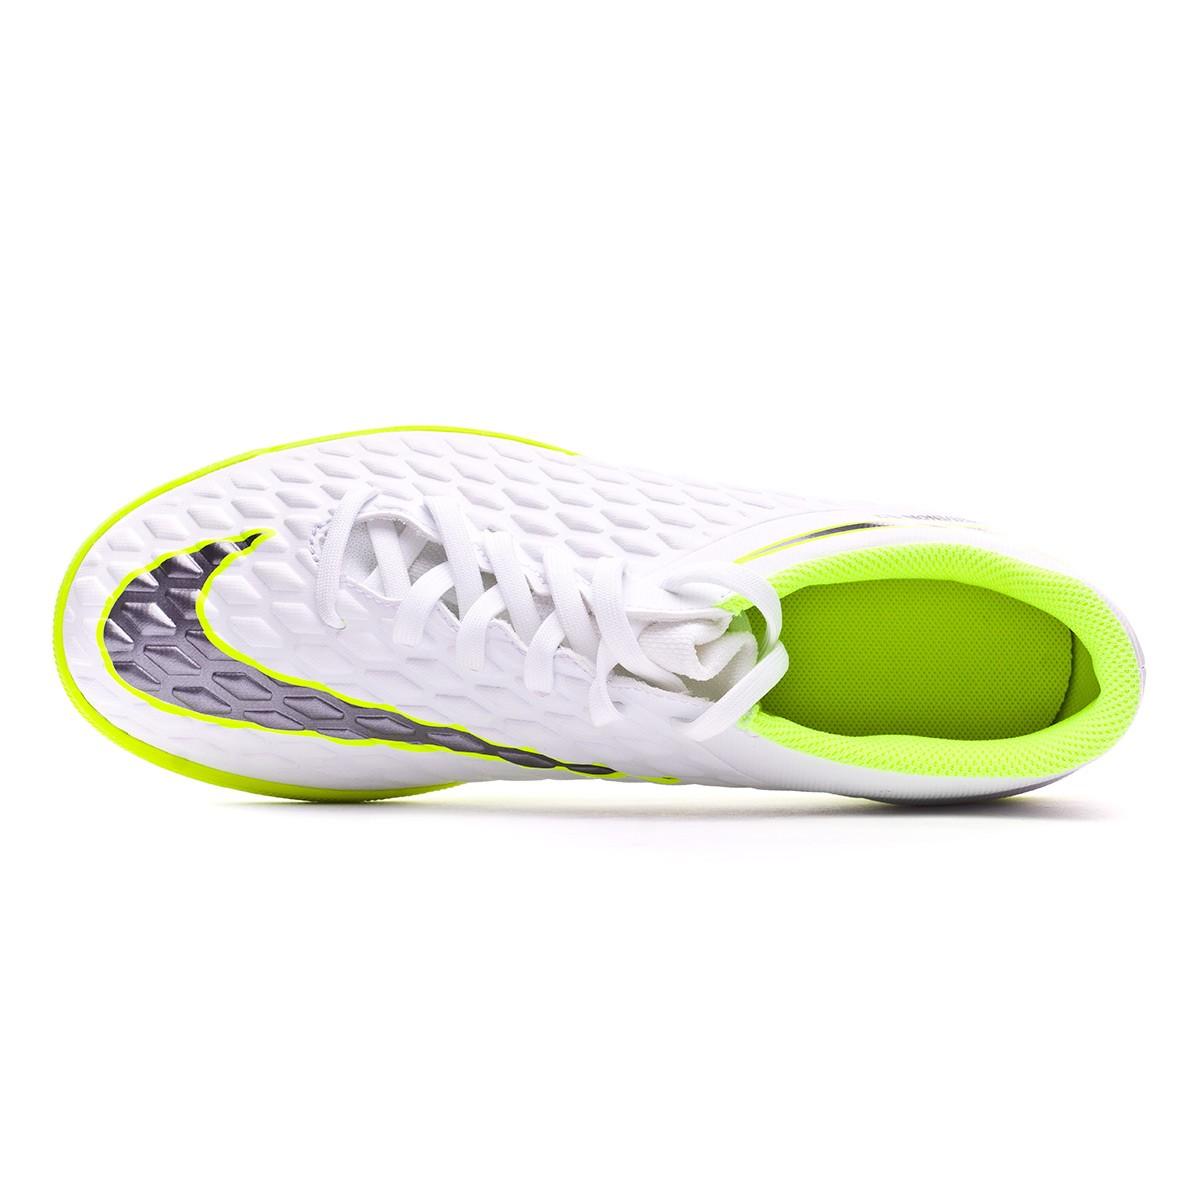 593be1de99b7 Futsal Boot Nike Hypervenom PhantomX III Club IC White-Metallic cool  grey-Volt-Metallic cool g - Football store Fútbol Emotion